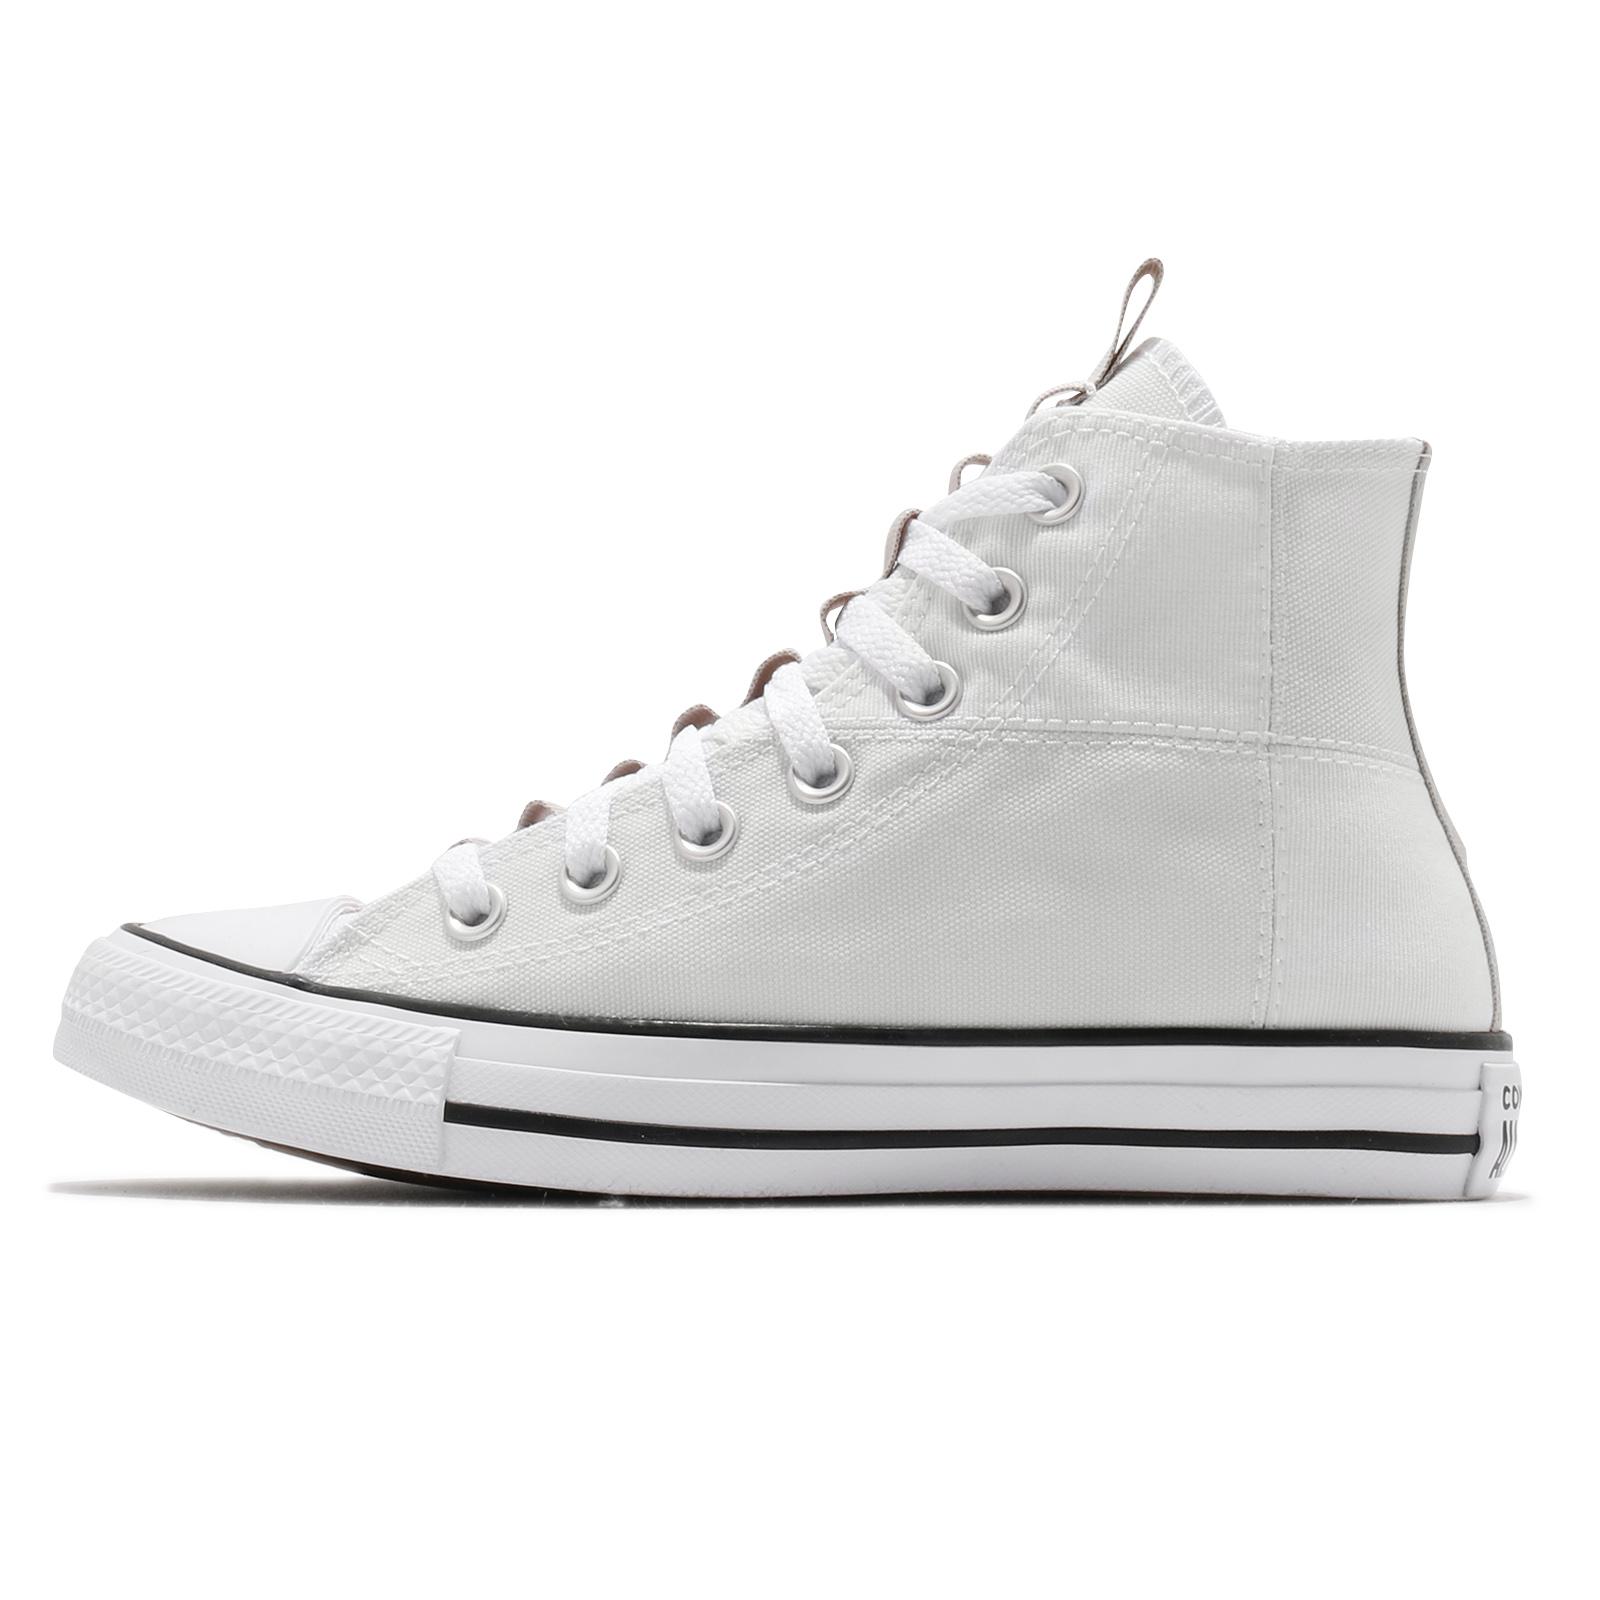 Converse 休閒鞋 Chuck Taylor All Star 白 灰 男女鞋 高筒 【ACS】 170131C